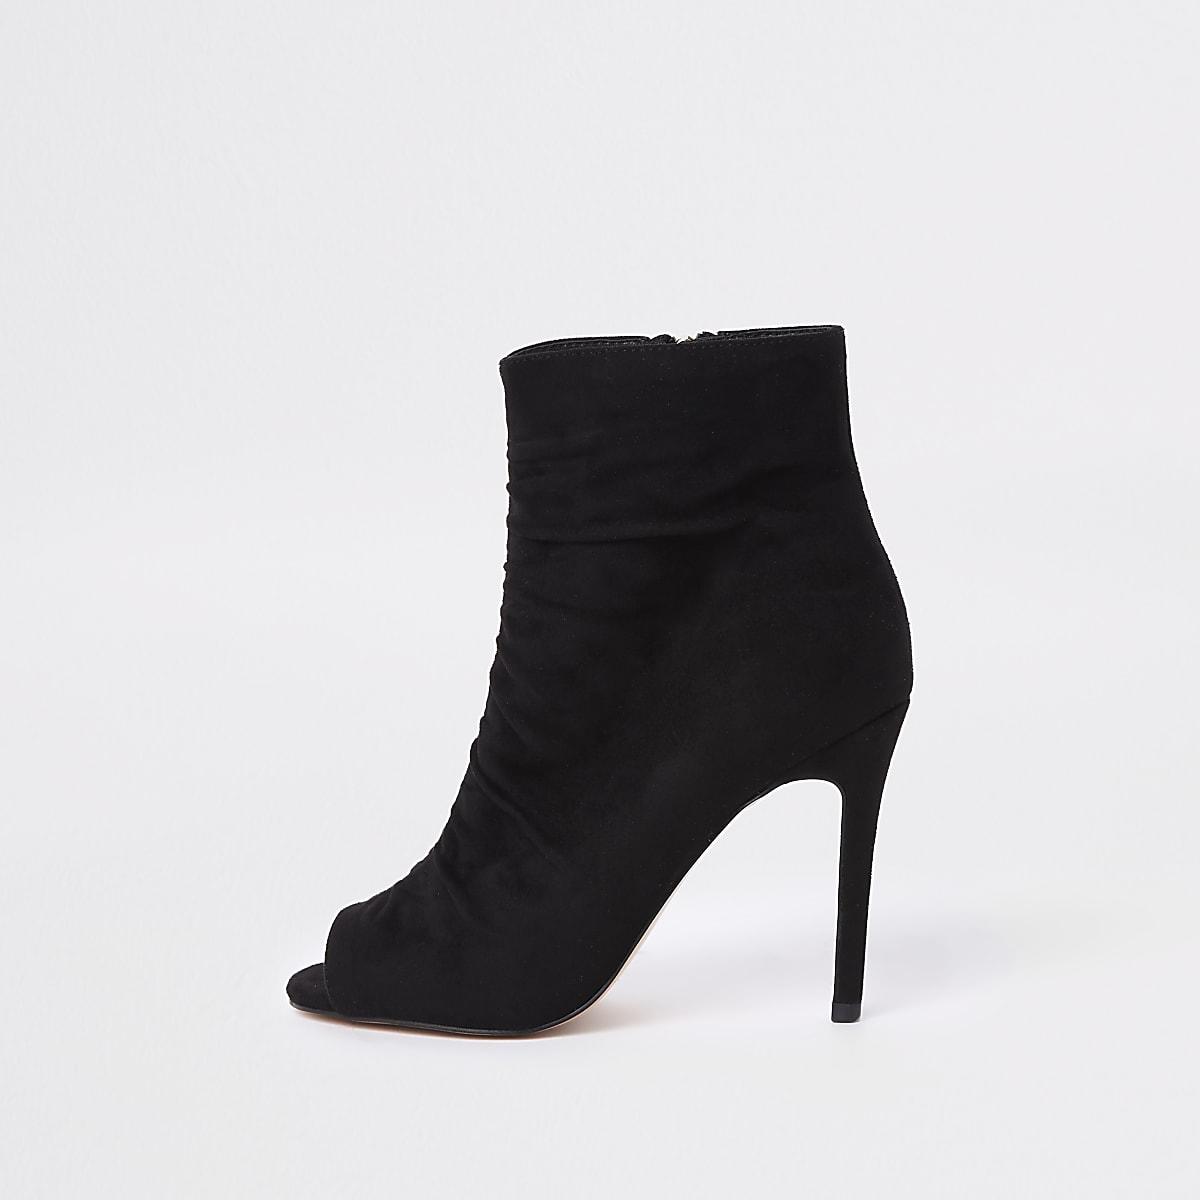 Black faux suede open toe shoe boot